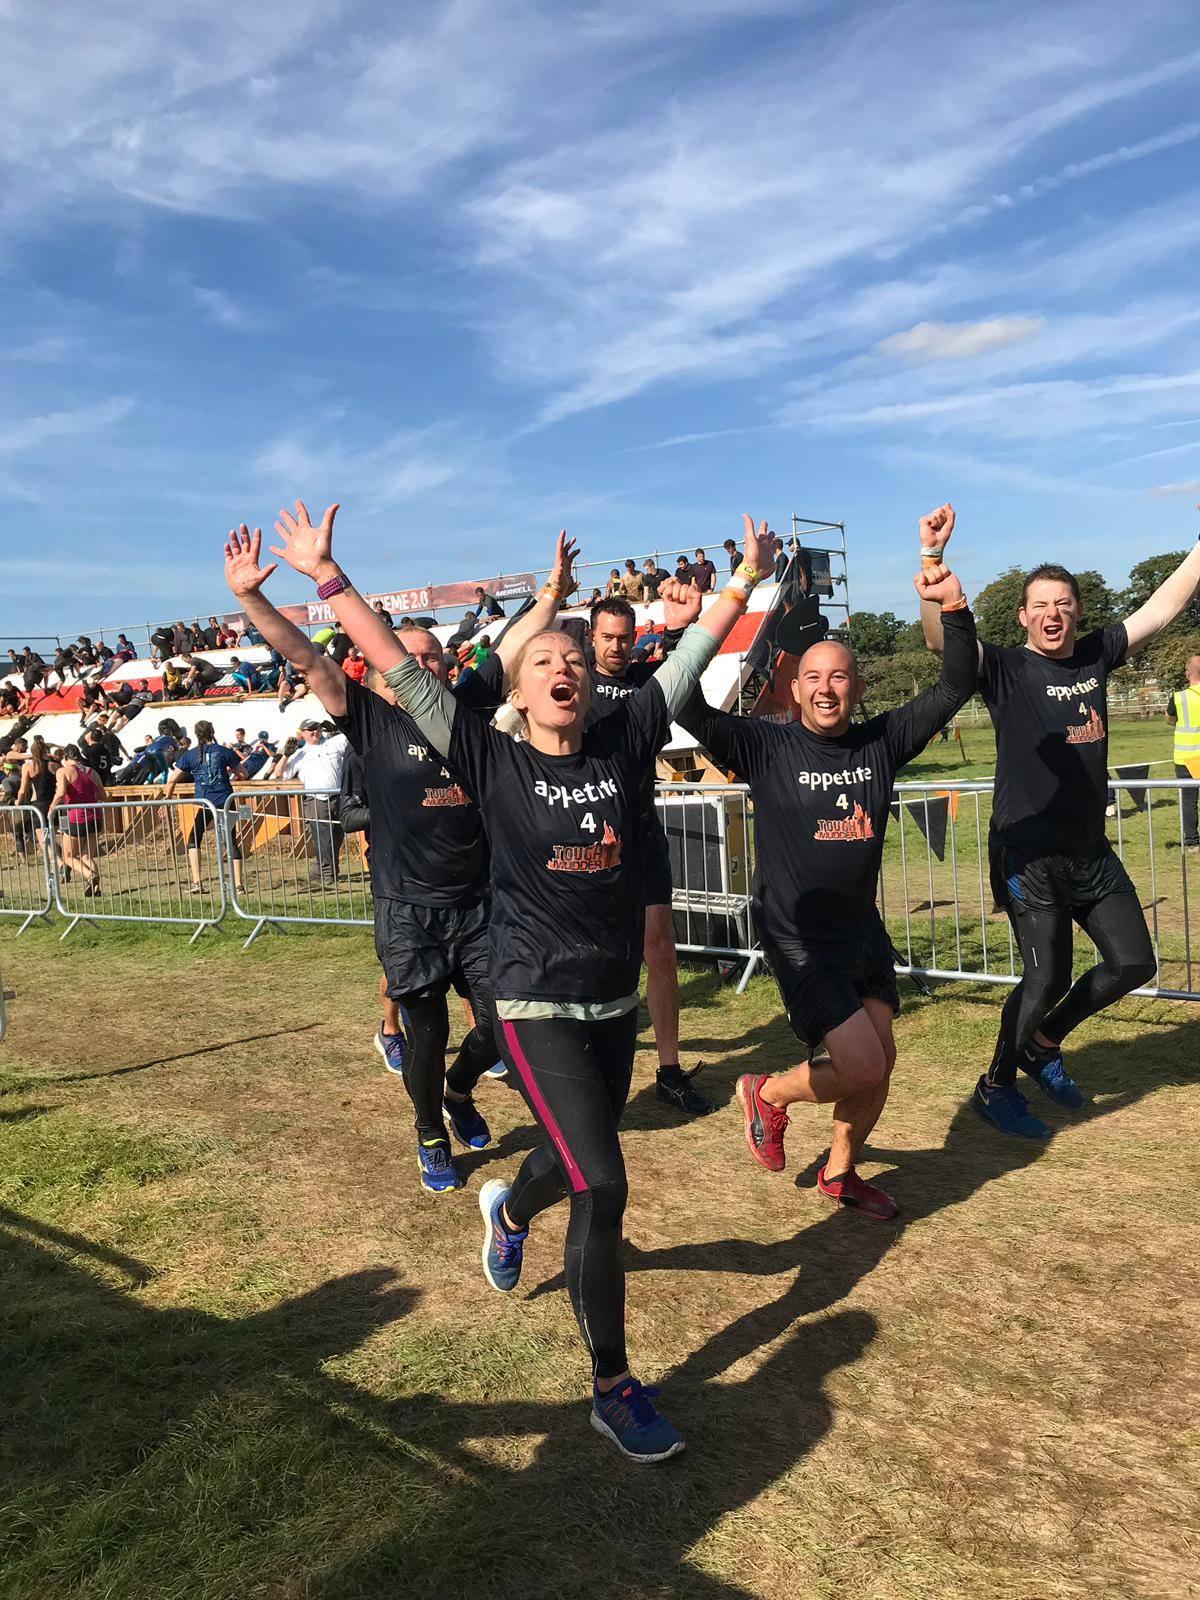 team running in a race